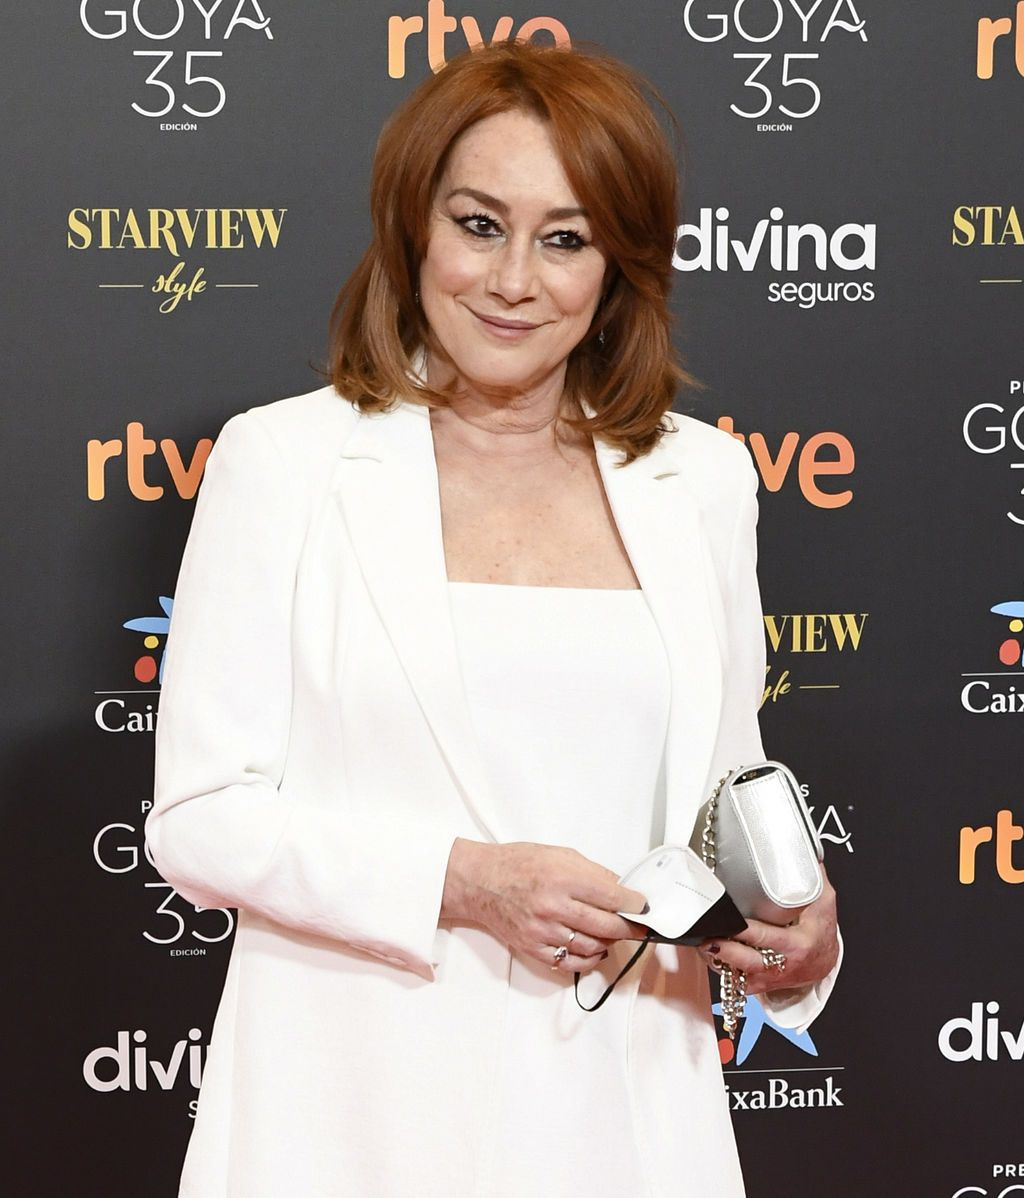 Gracia Querejeta en la alfombra roja de los Premios Goya 2021